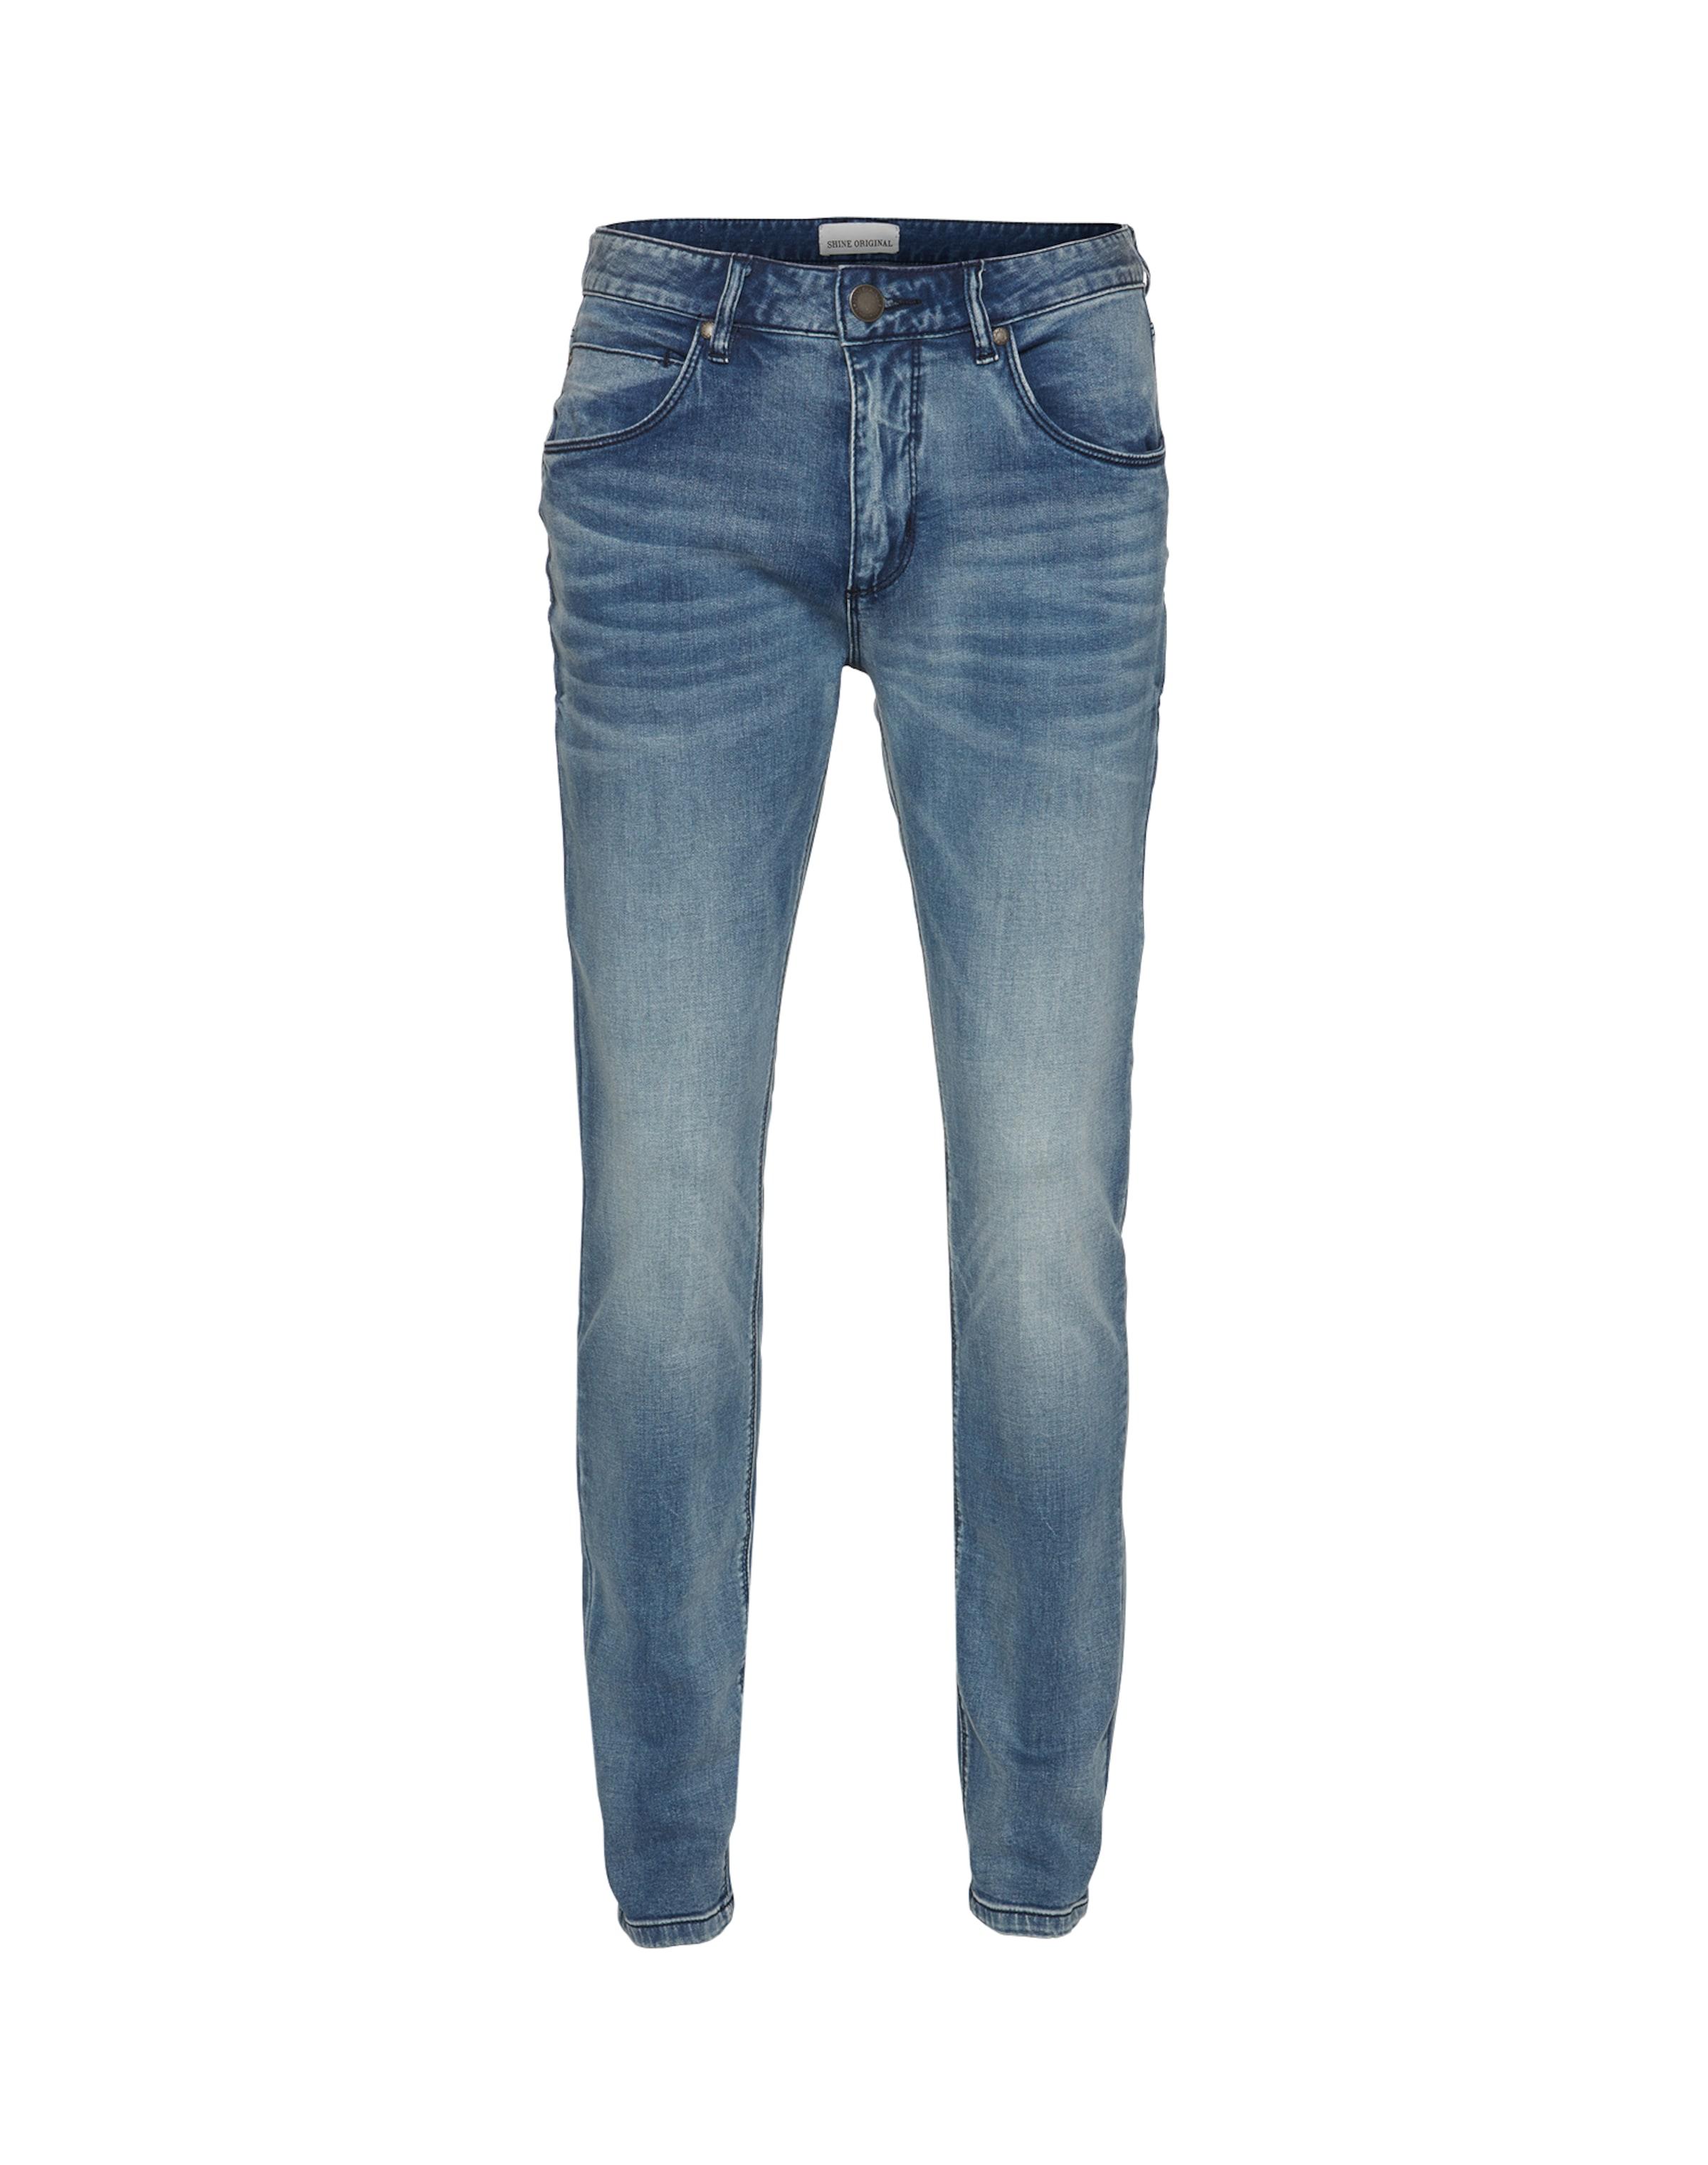 In Jeans Denim Original Fit' Shine 'skinny Blue c5qSAj4R3L